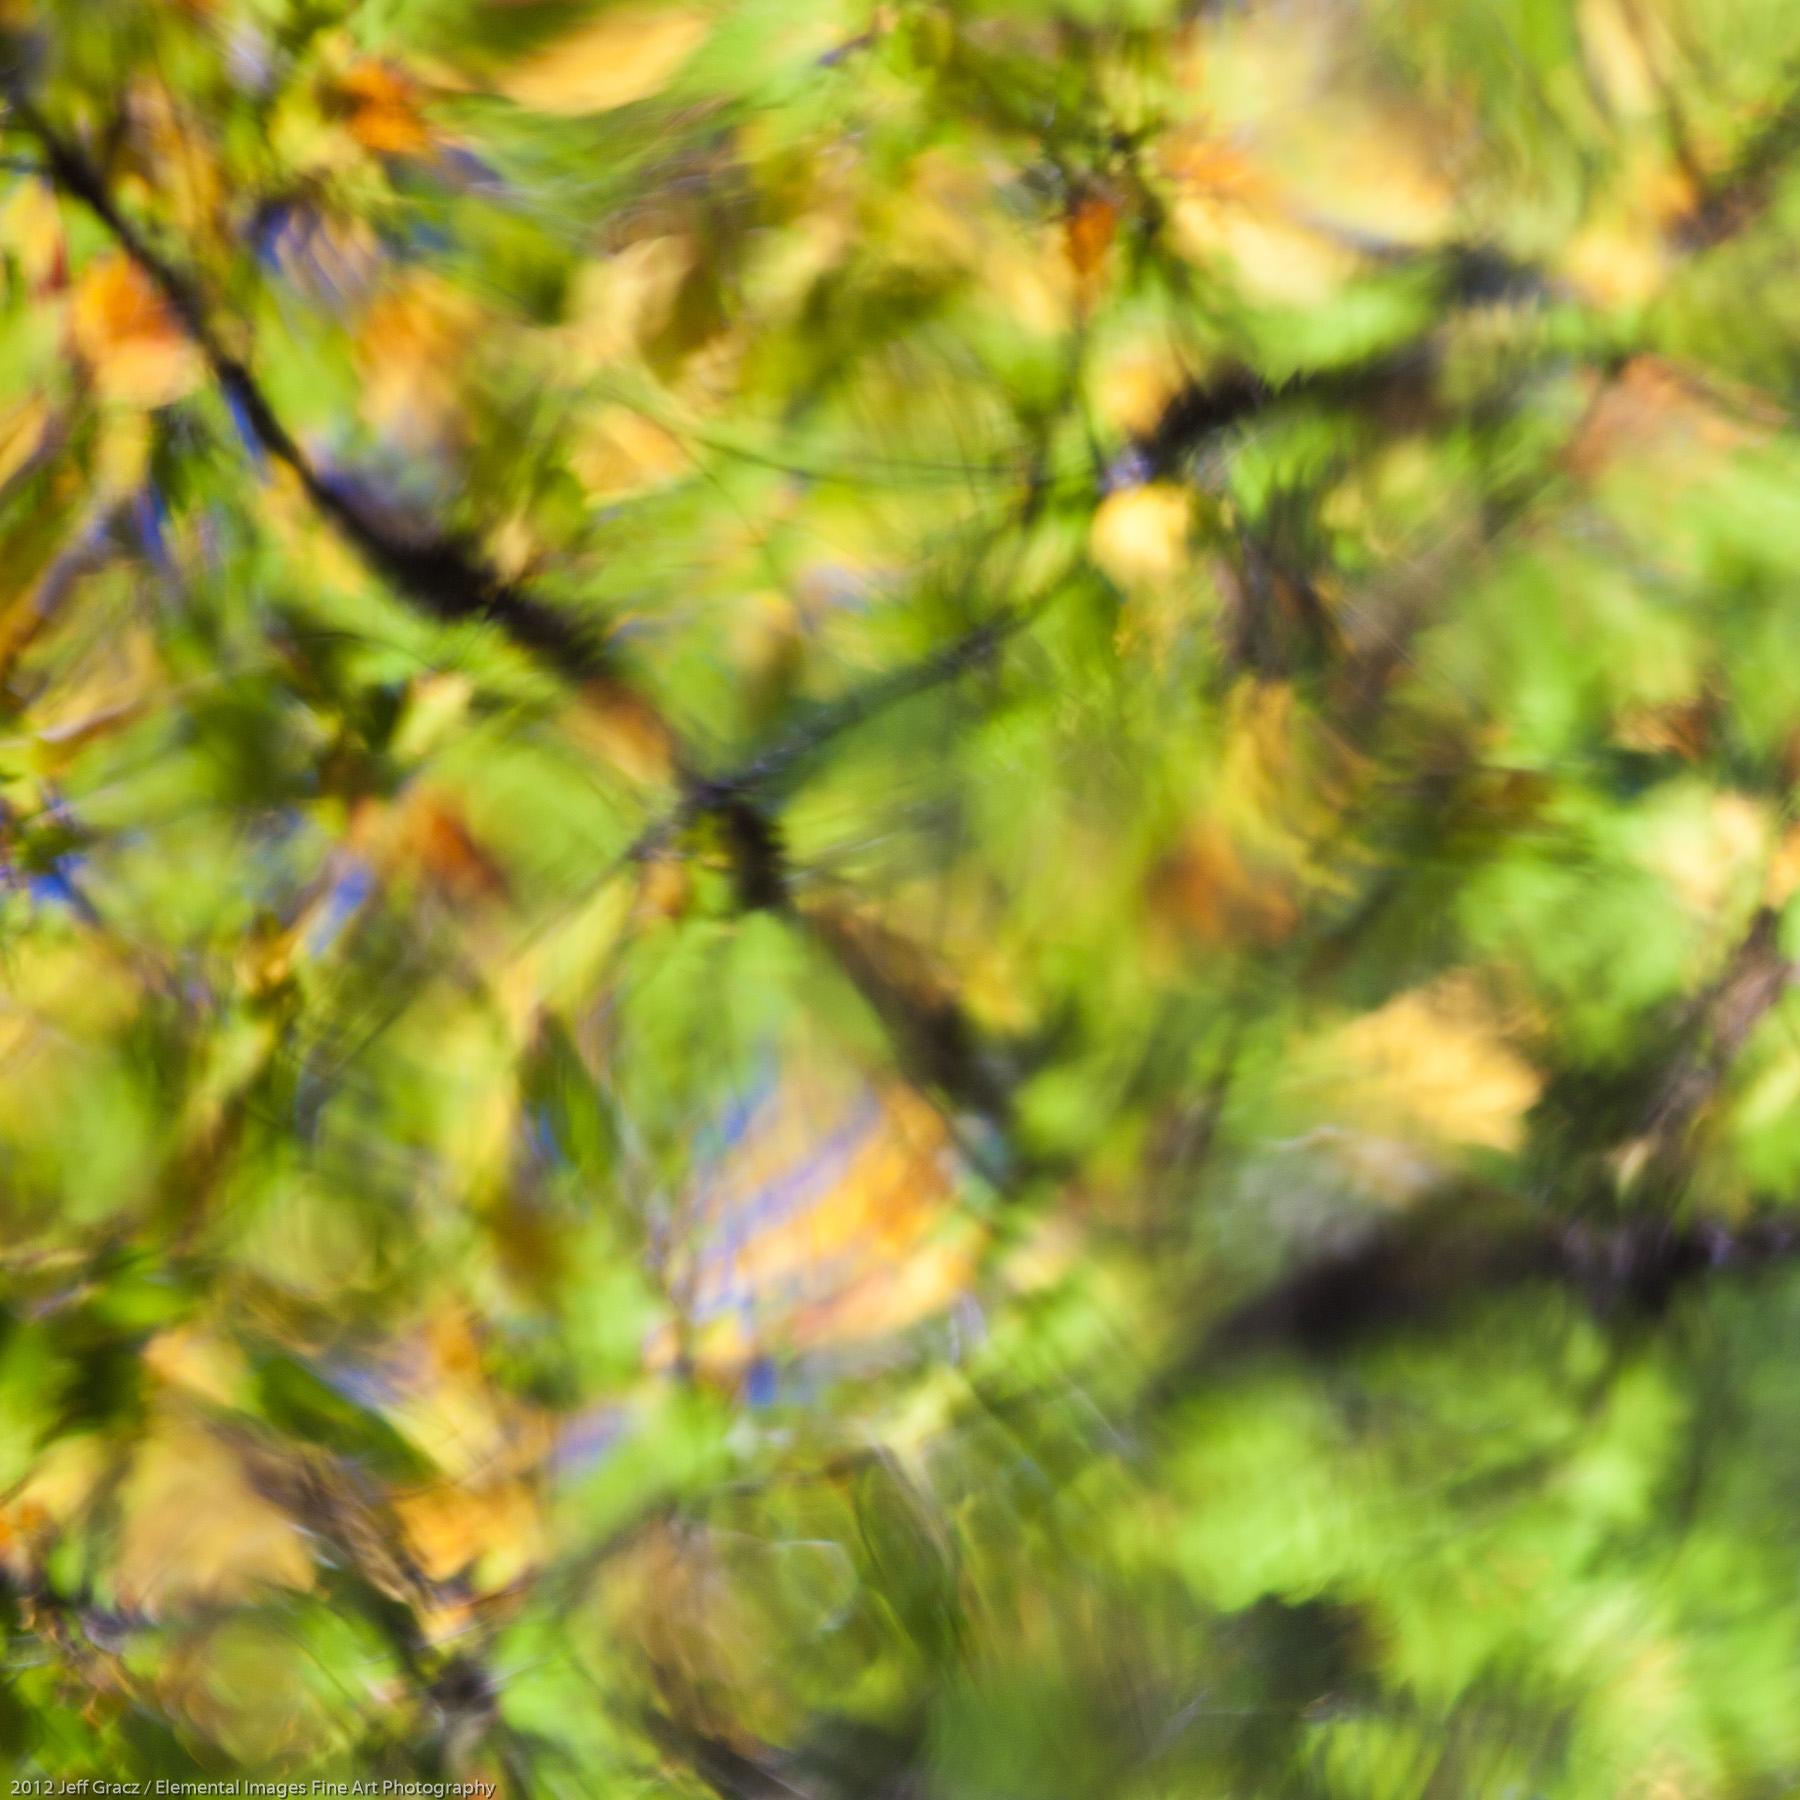 Water Reflection IV | Kejimkujik National Park | Nova Scotia | Canada - © 2012 Jeff Gracz / Elemental Images Fine Art Photography - All Rights Reserved Worldwide